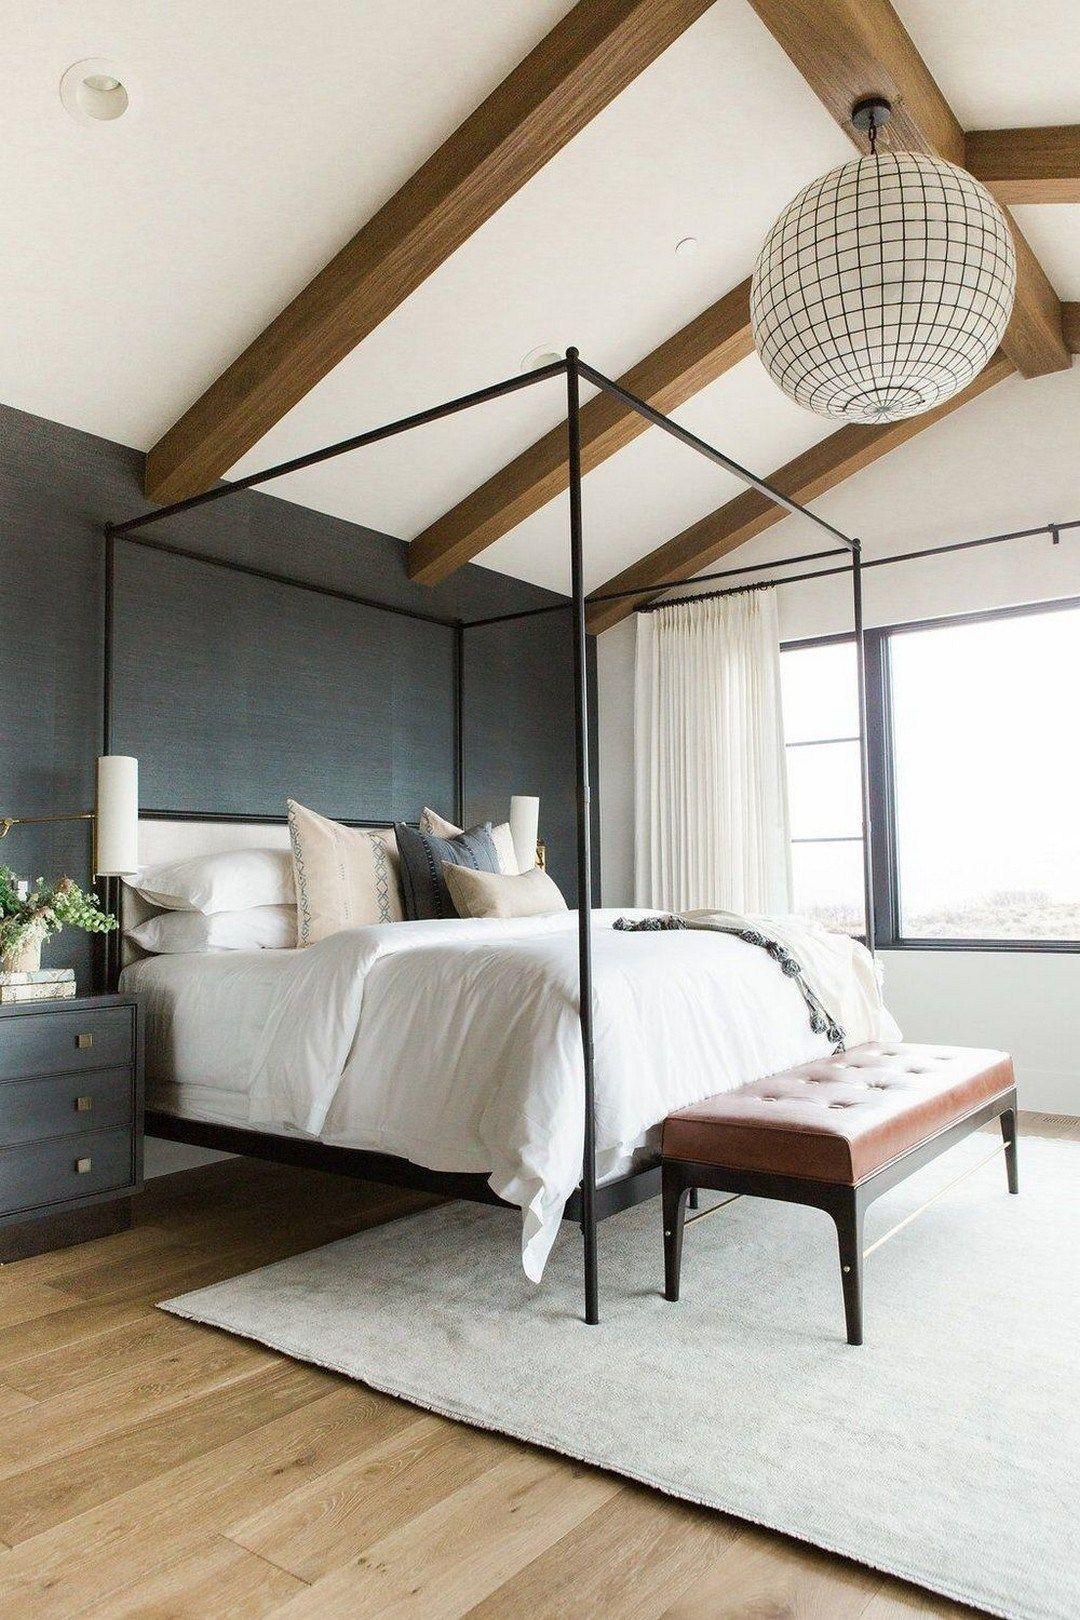 Aesthetic Master Bedroom With Lighting Fixture Ideas 13 Modern Farmhouse Master Bedroom Modern Farmhouse Bedroom Home Decor Bedroom